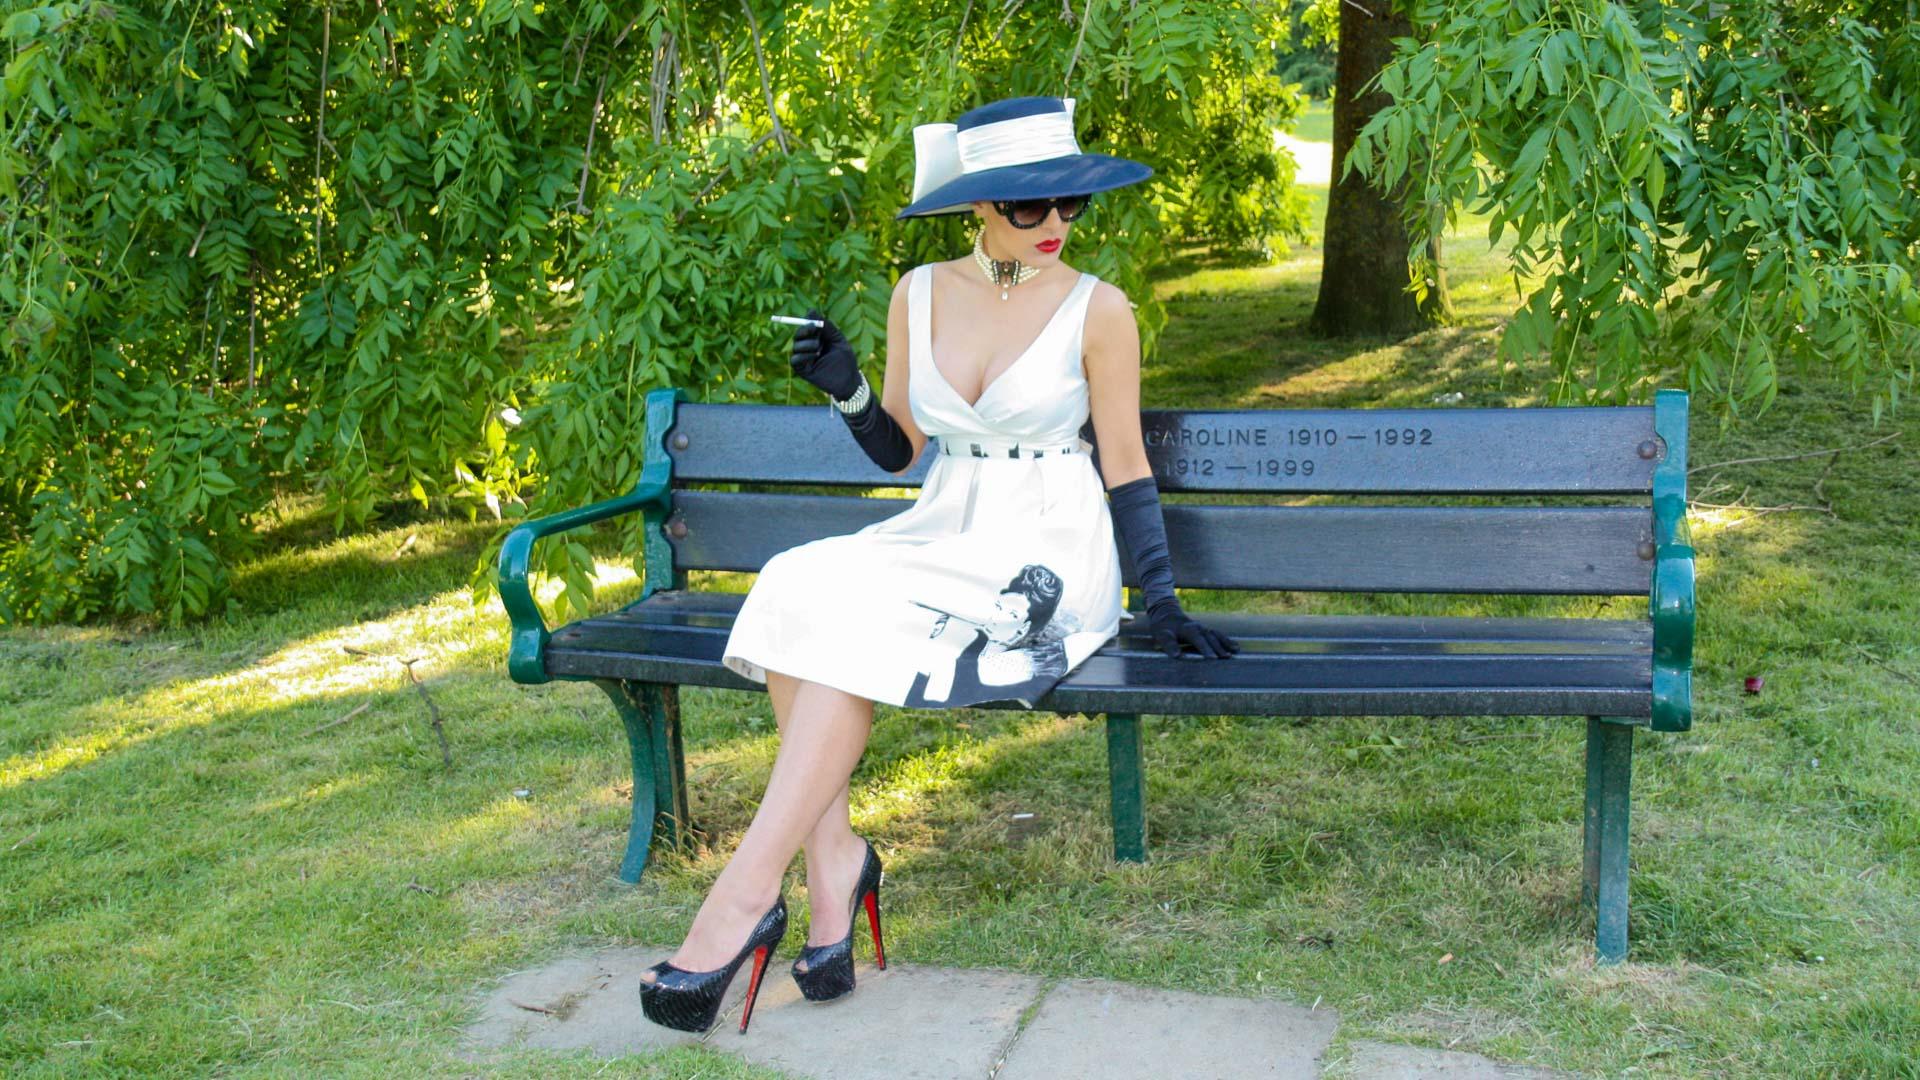 fashion, handpainted dress, photography, photographer, art, artist, bobbibicker, valbonabickerart, trompeoleil, illusion, forrest, sky, door, beautiful, original, mural, muralist, surrey, london, uk